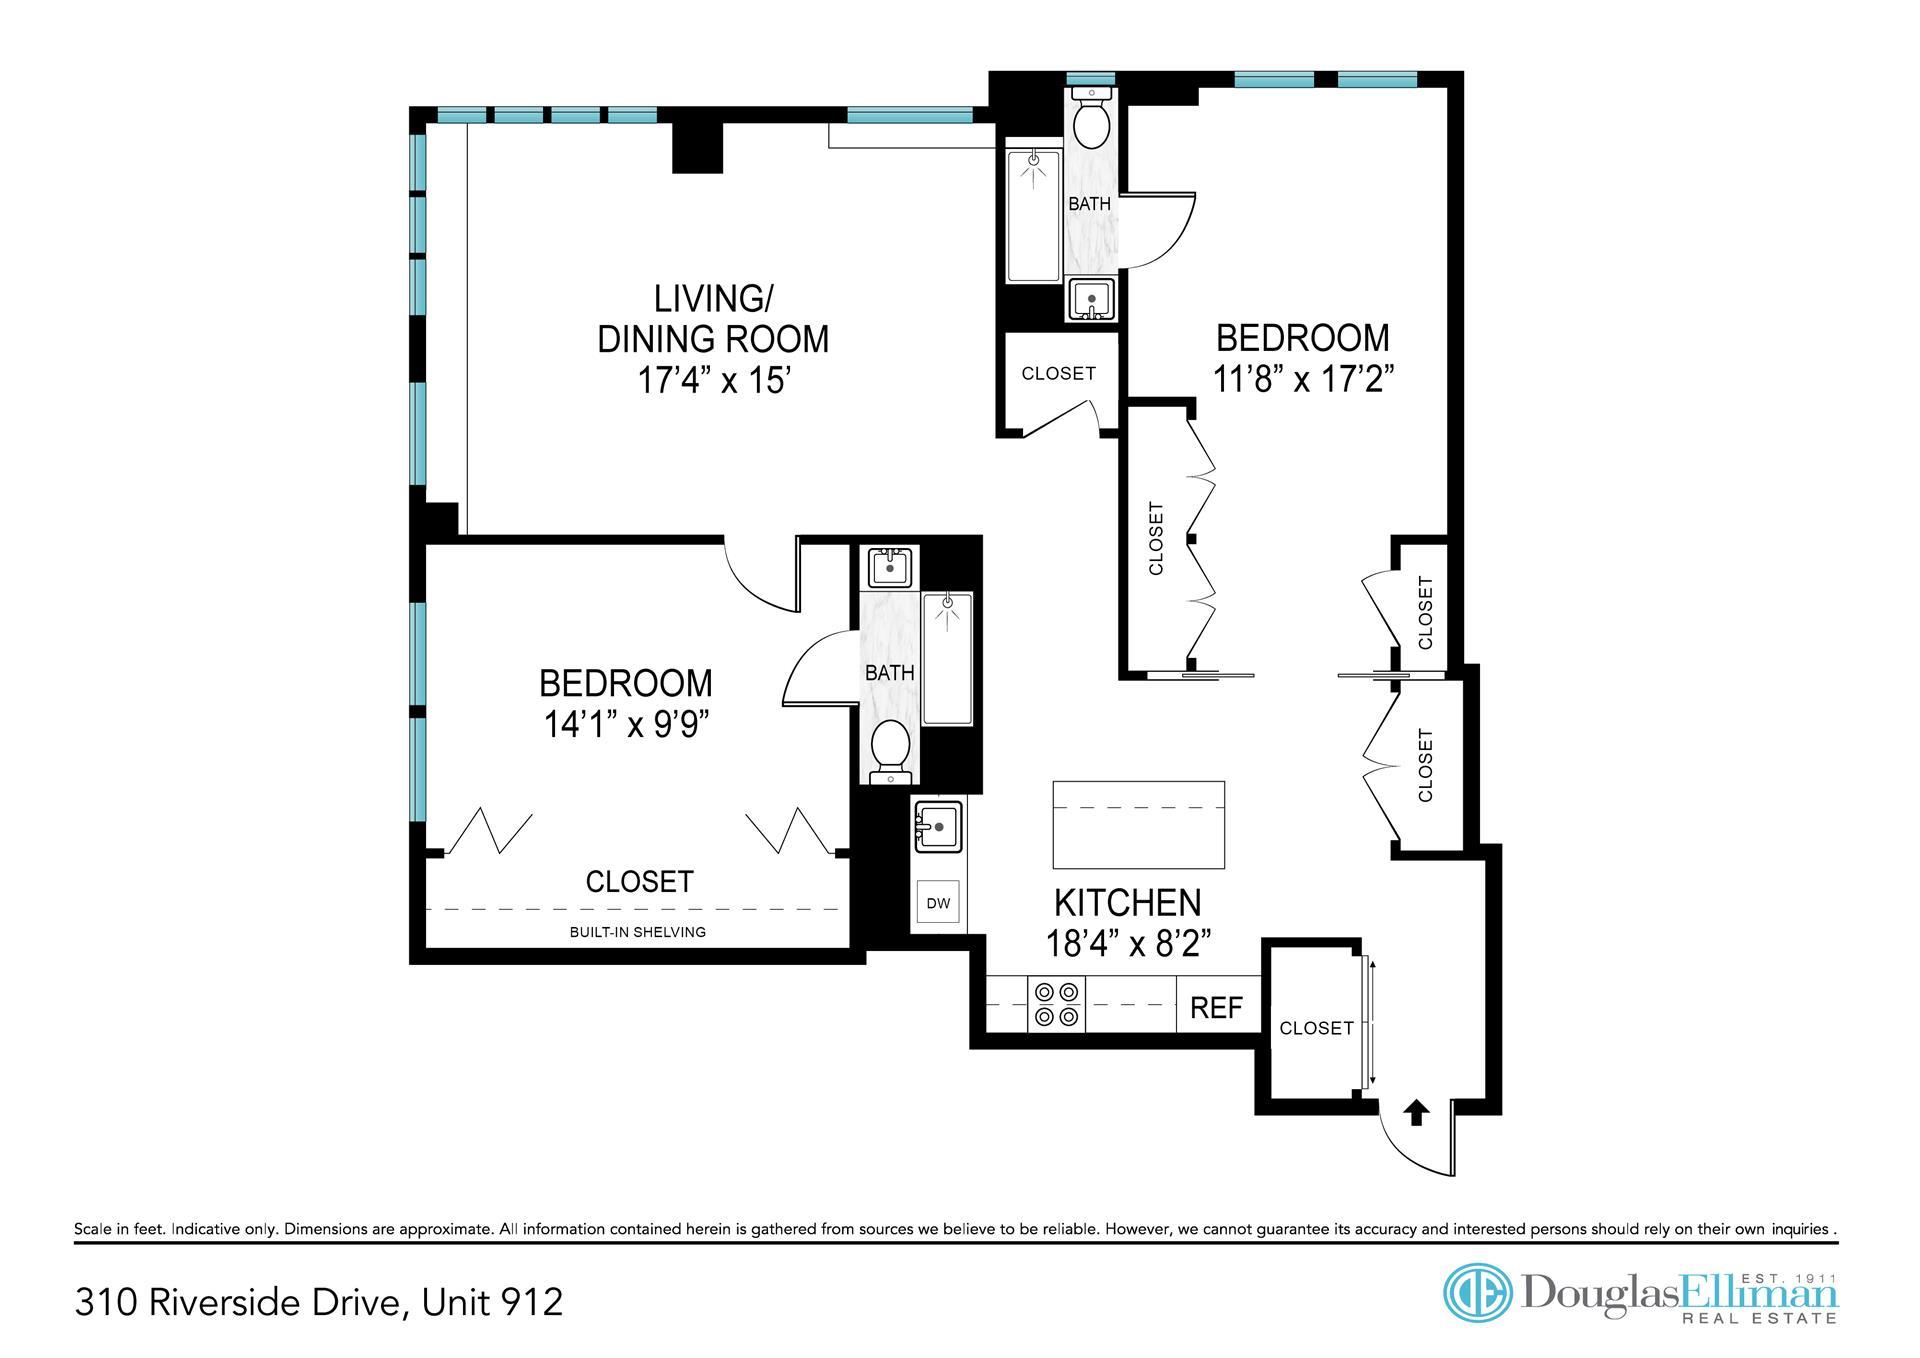 Floor plan of 310 Riverside Drive, 912 - Upper West Side, New York